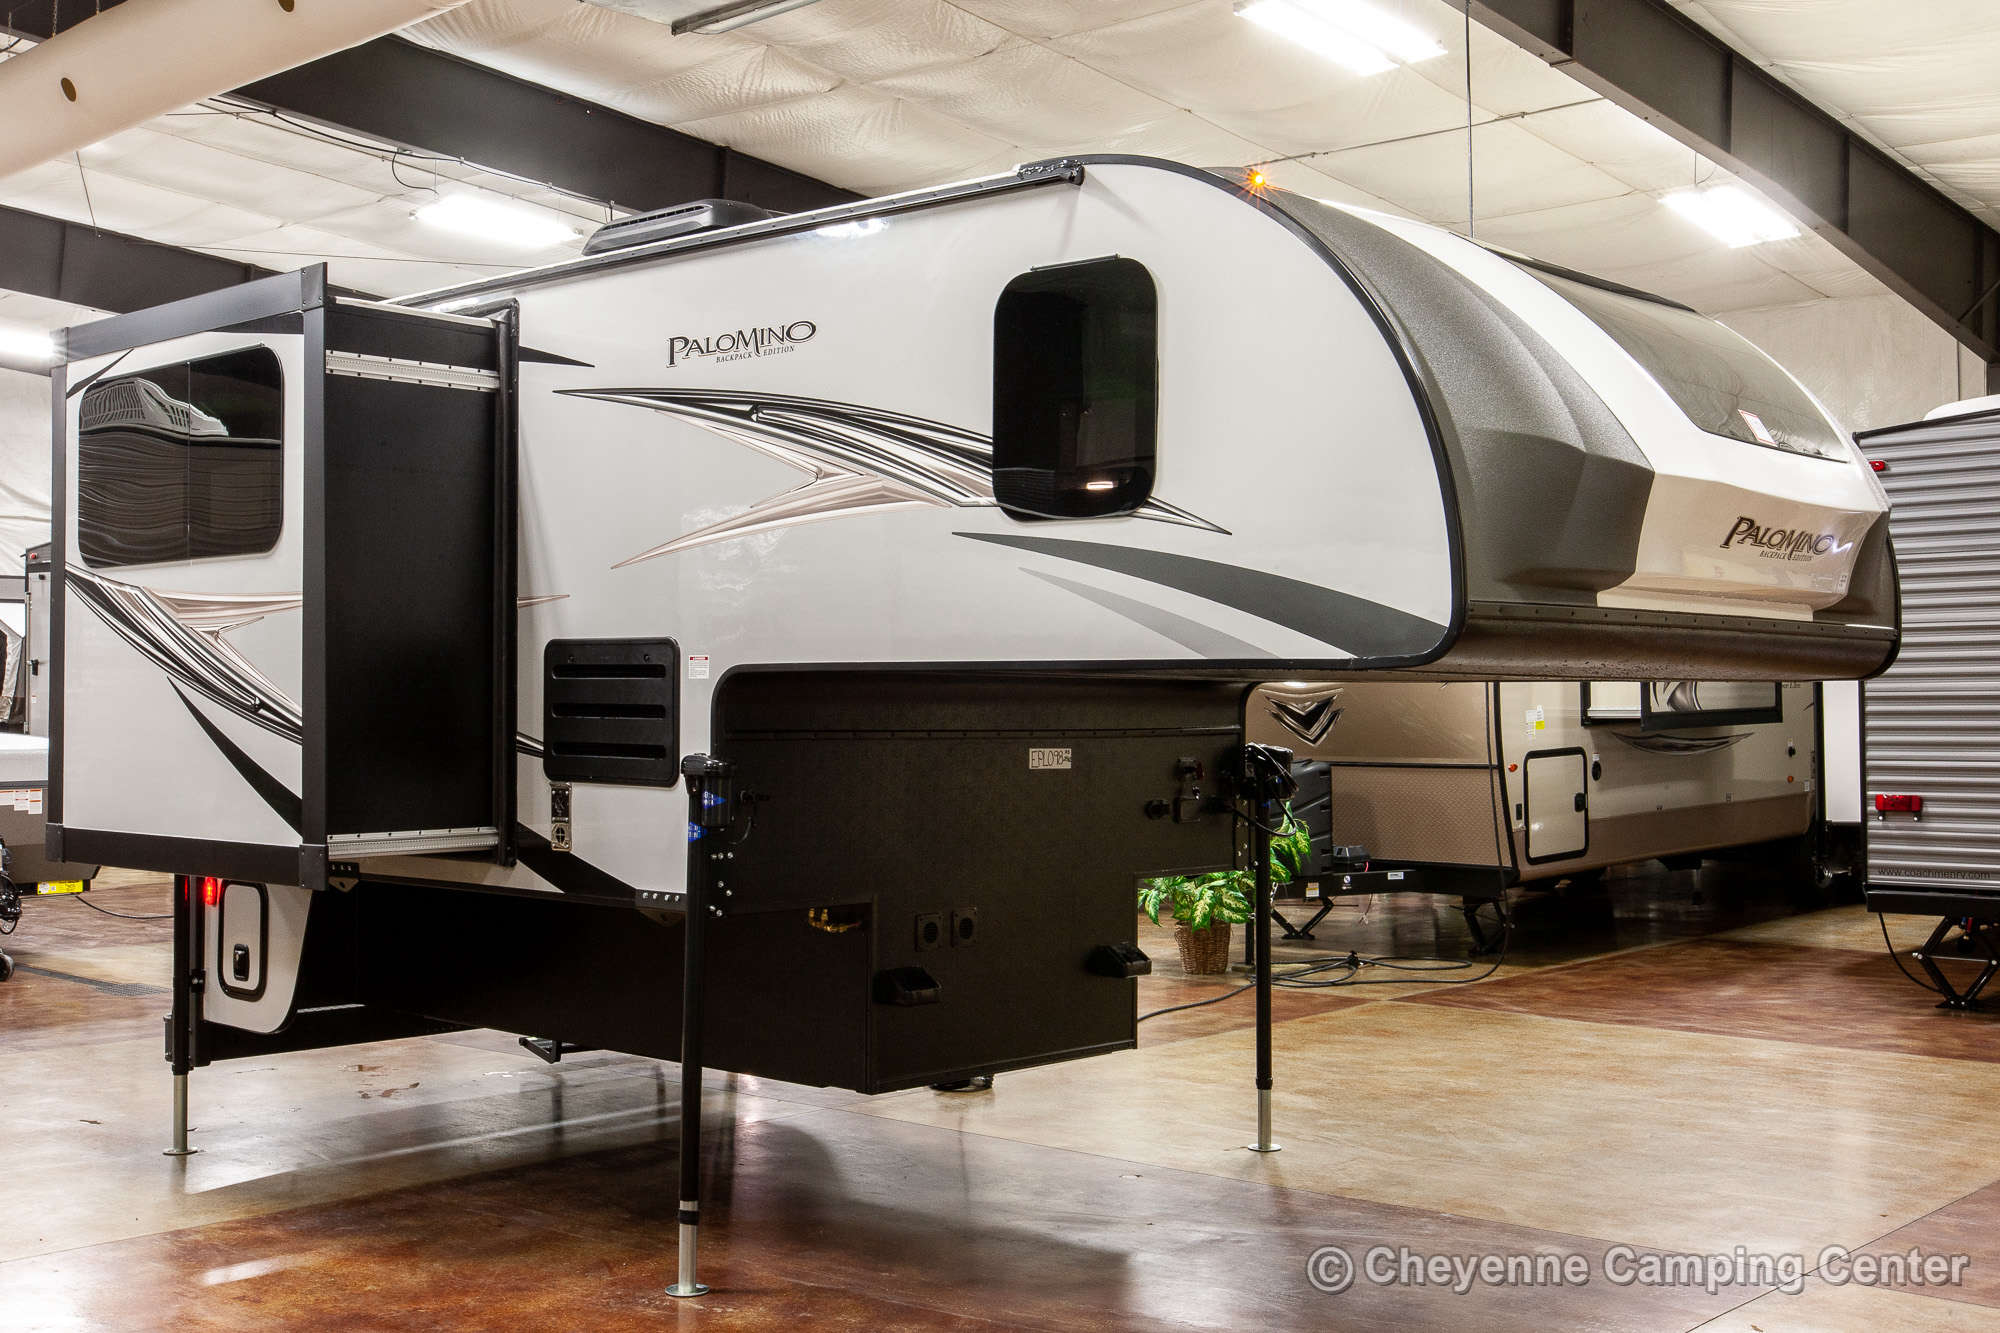 2020 Palomino BackPack HS-2902 Truck Camper Exterior Image